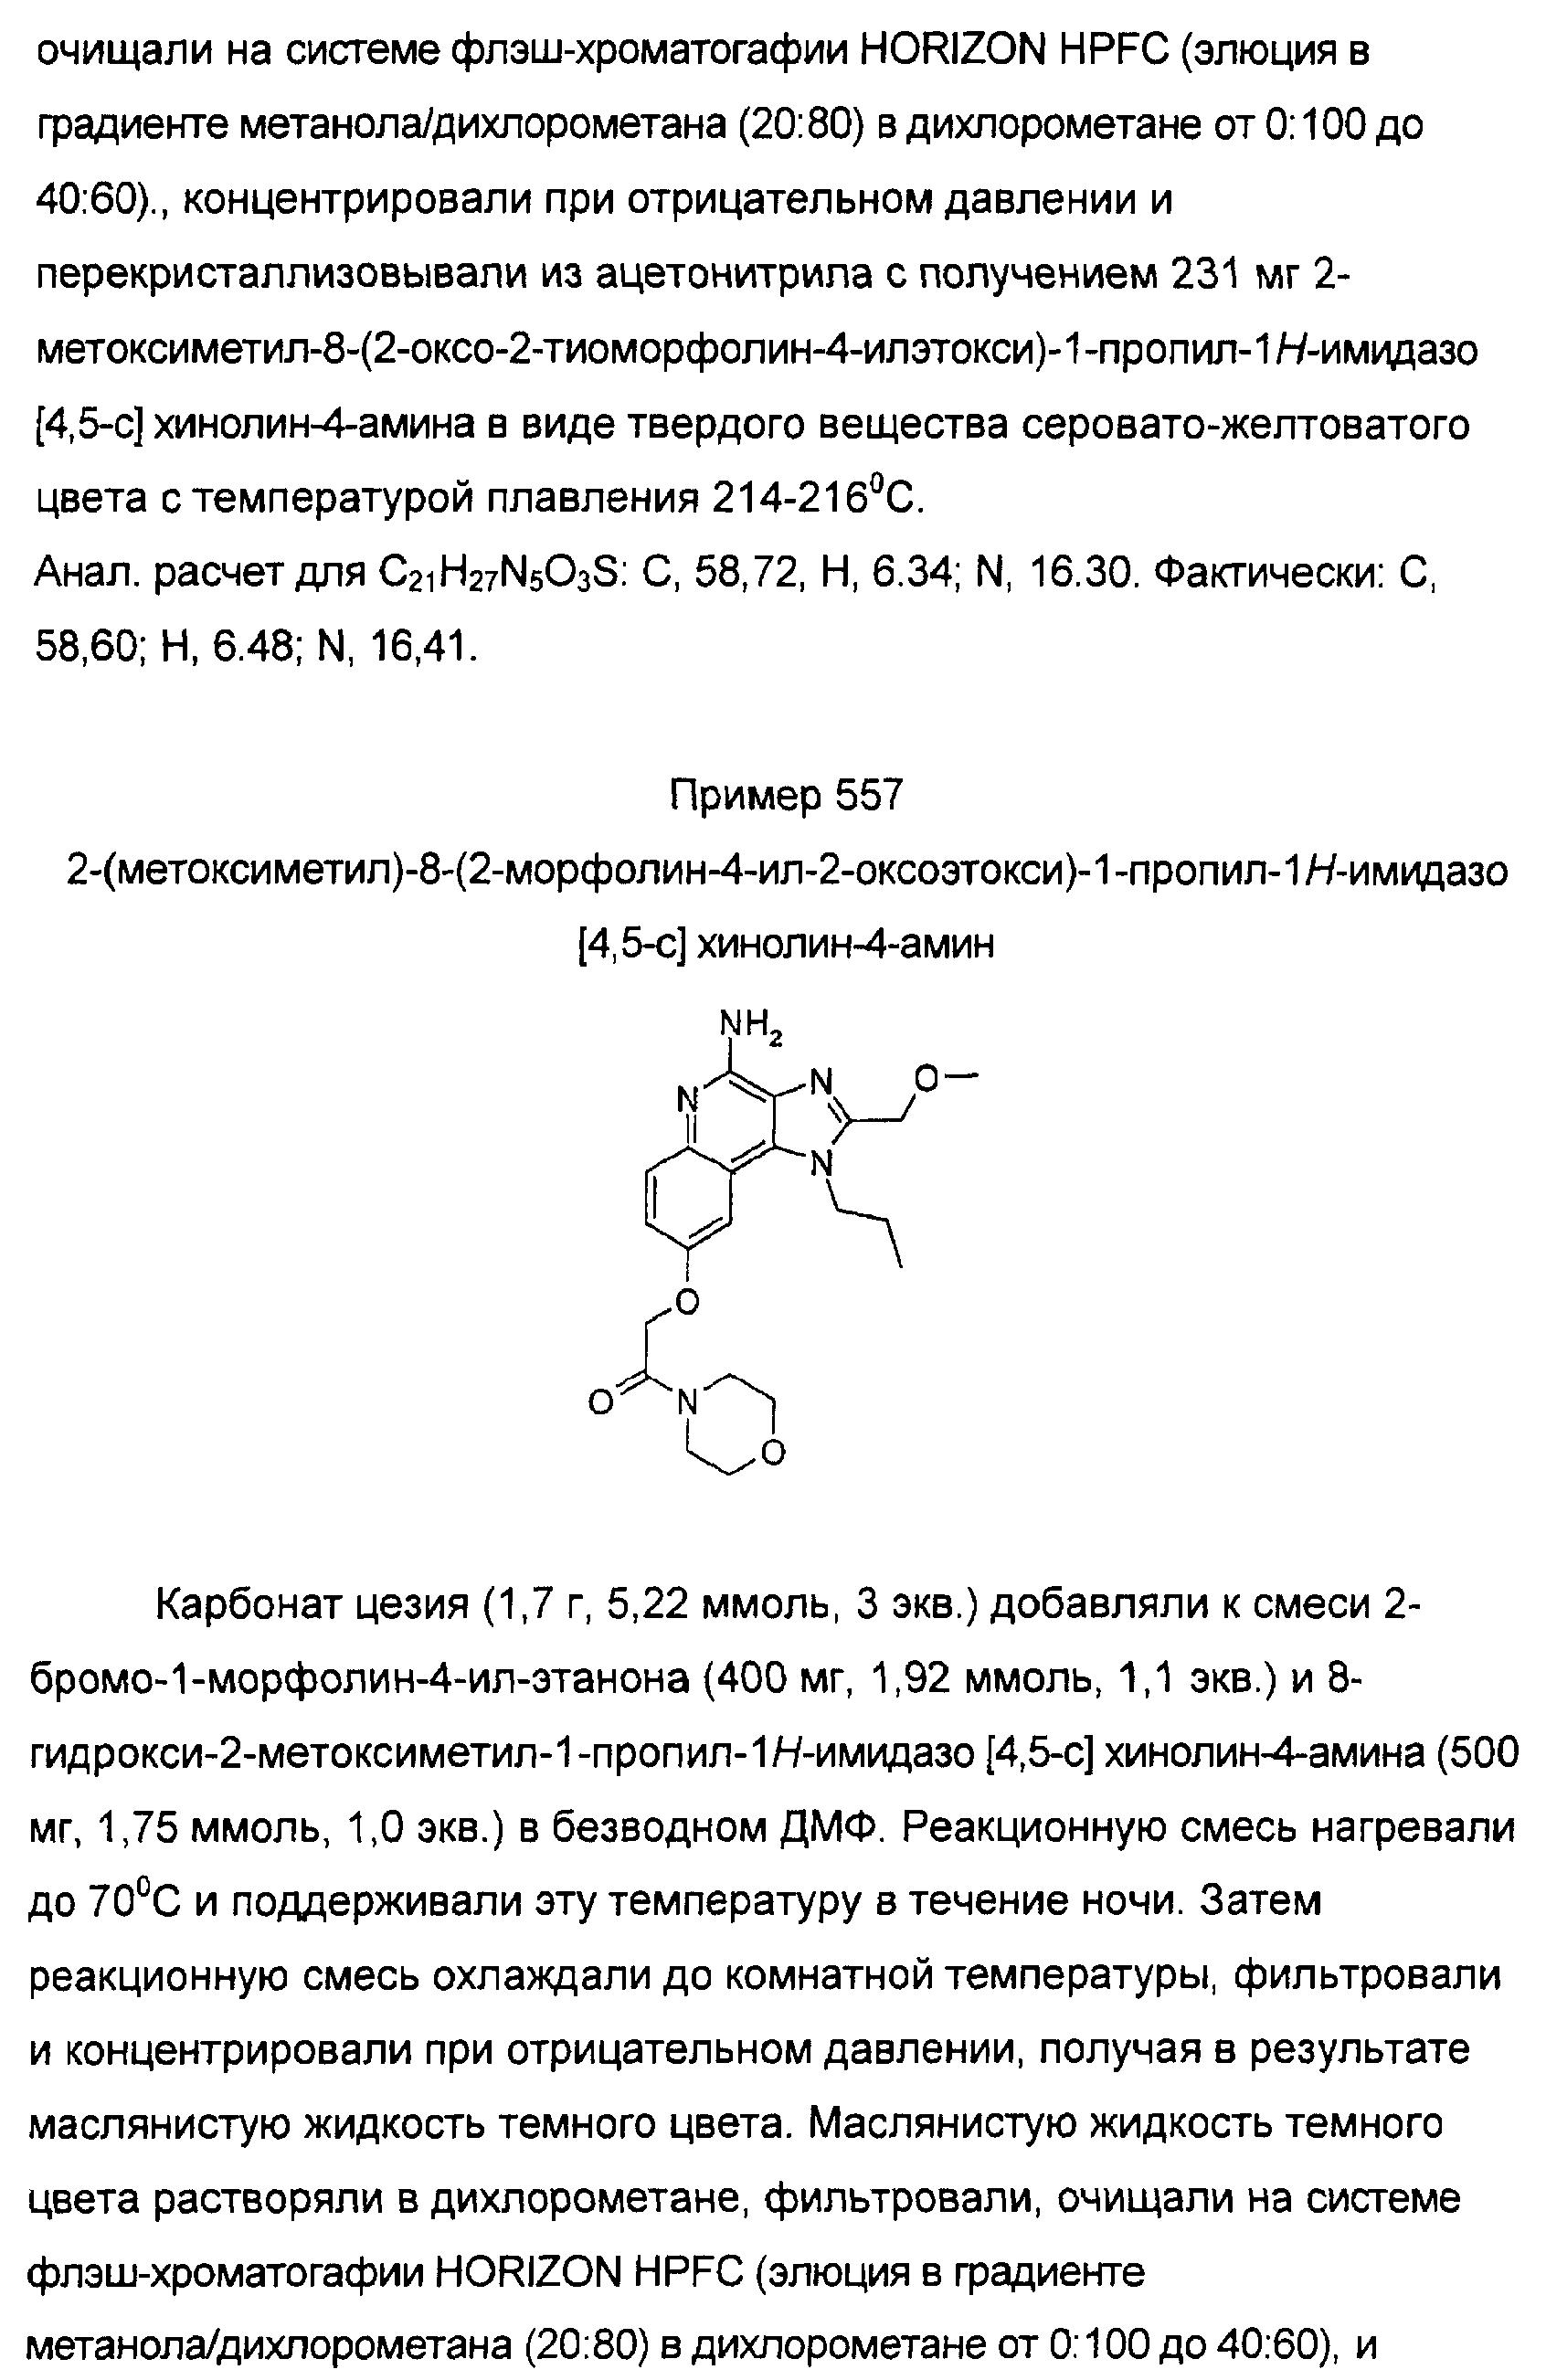 Figure 00000328